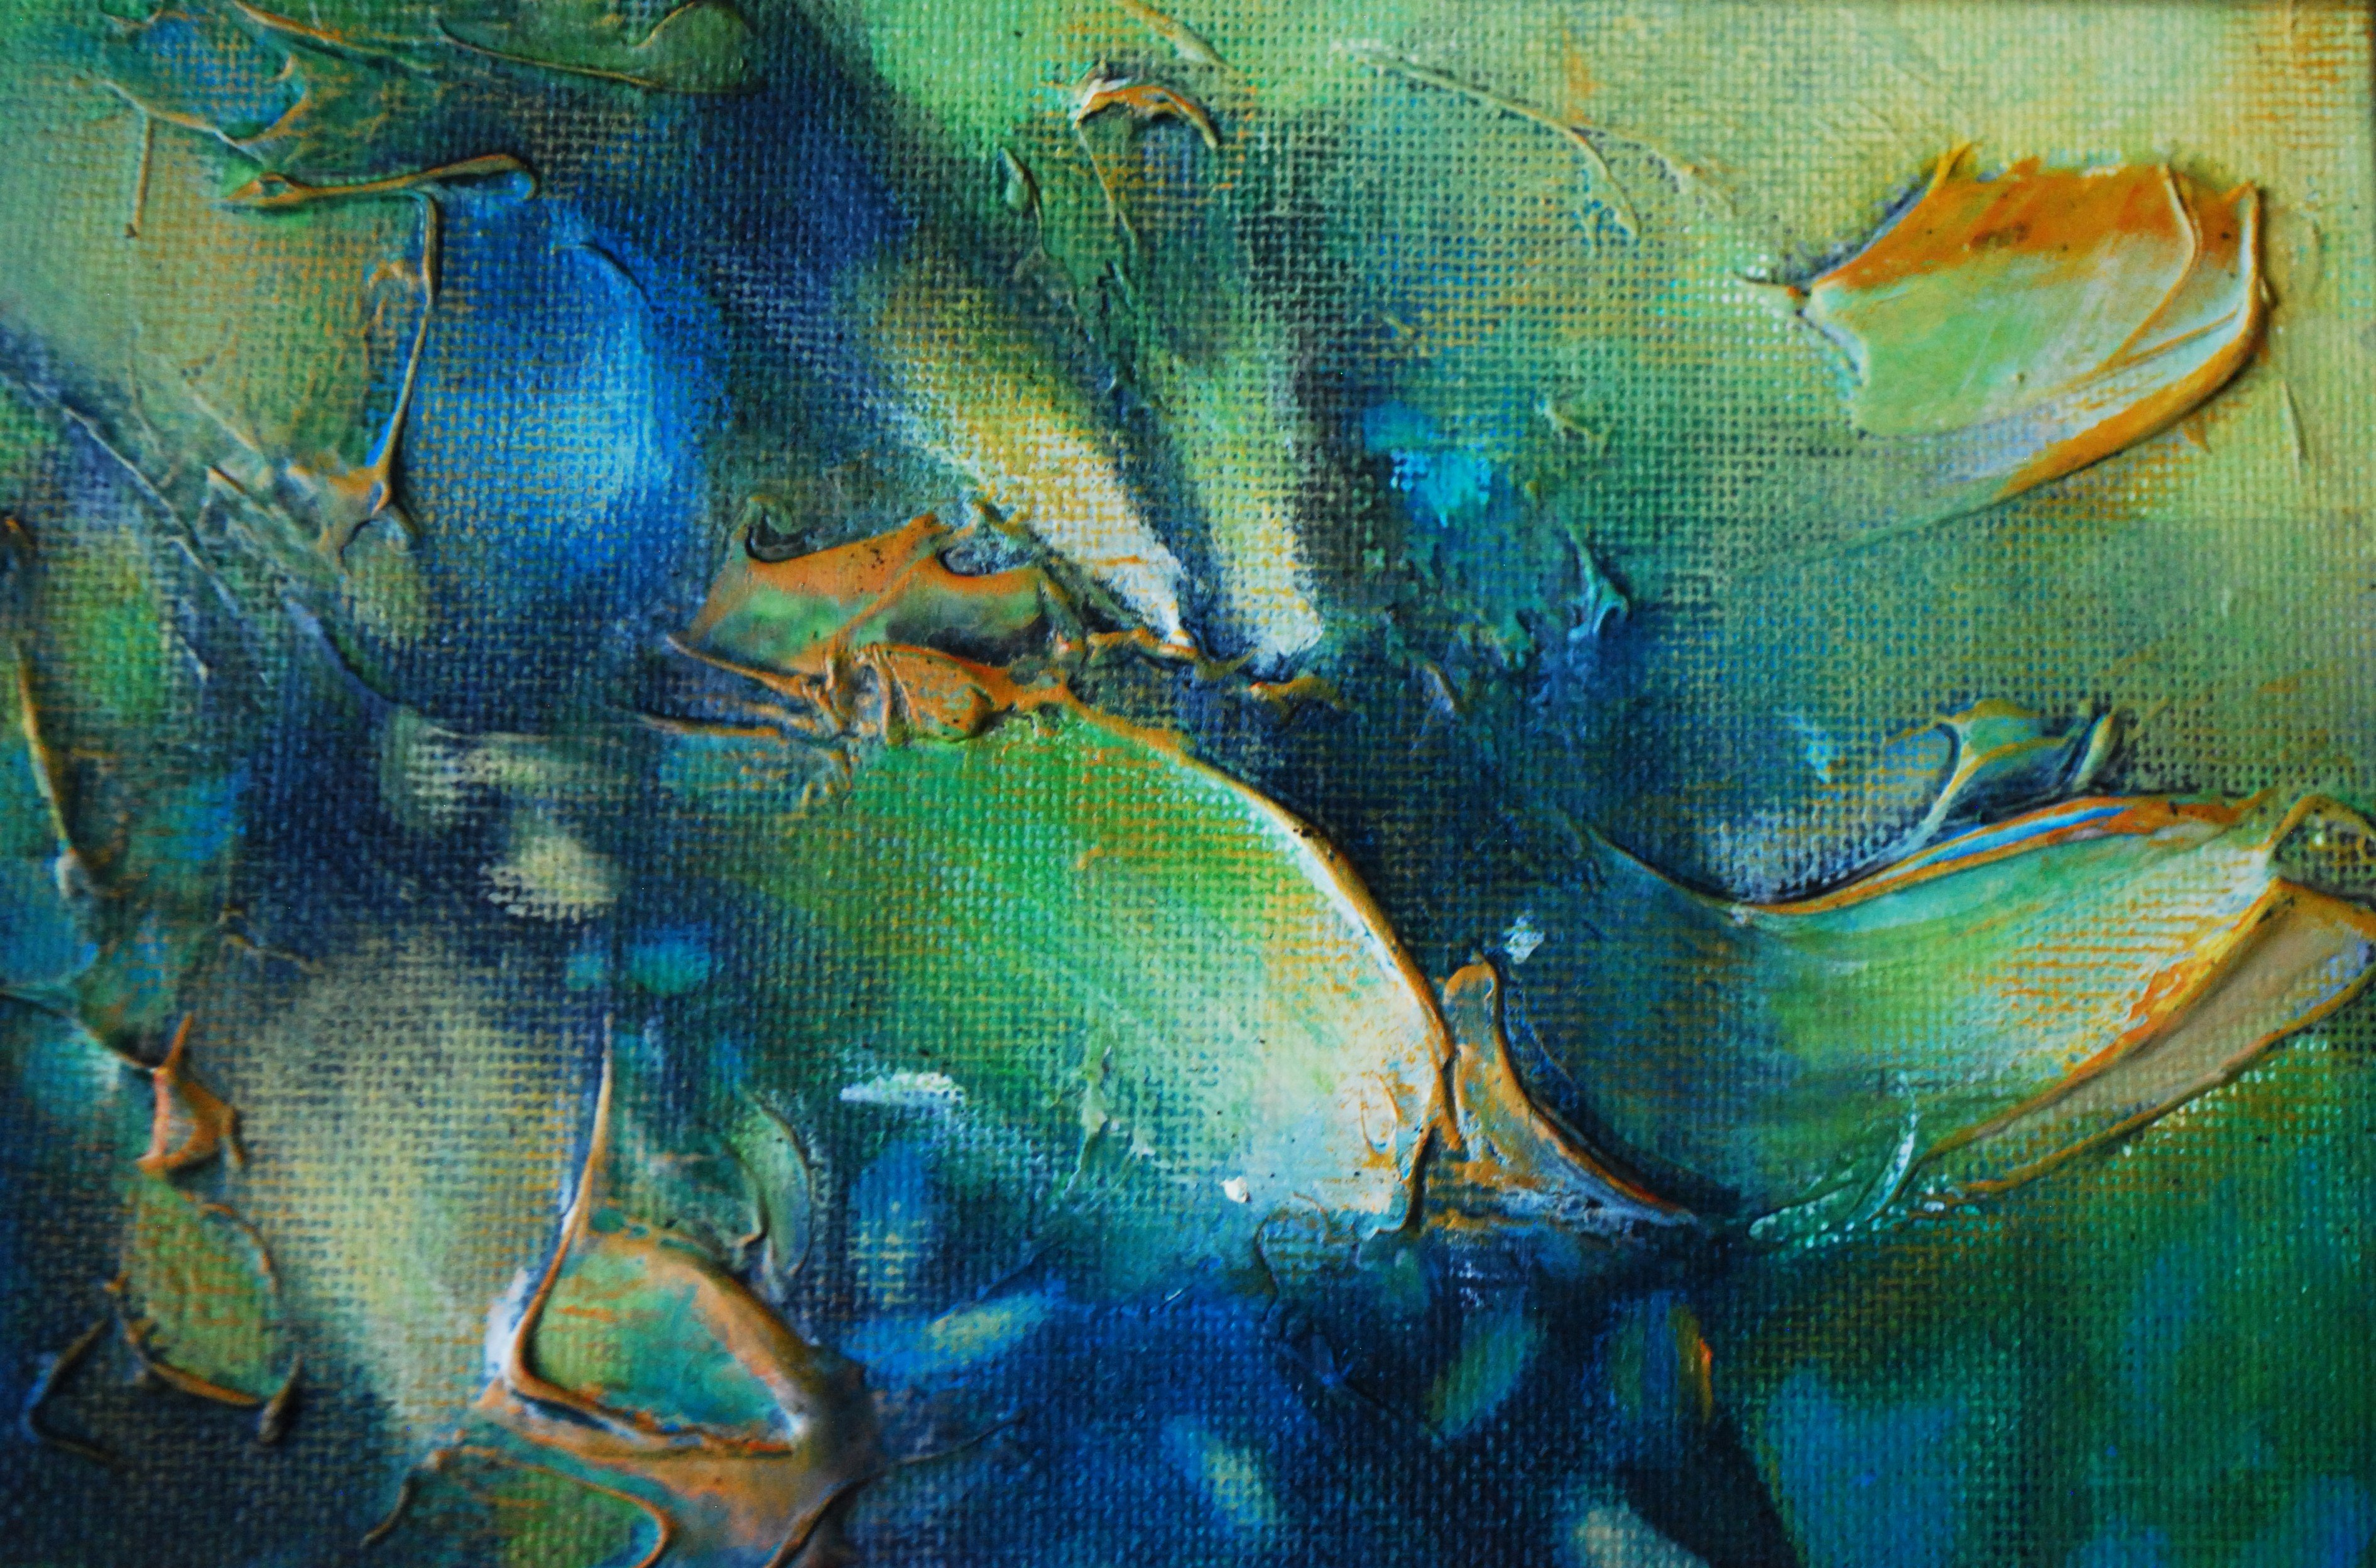 """Alegría 4"" by Vivian Calderón Bogoslavsky, 12x12cm"